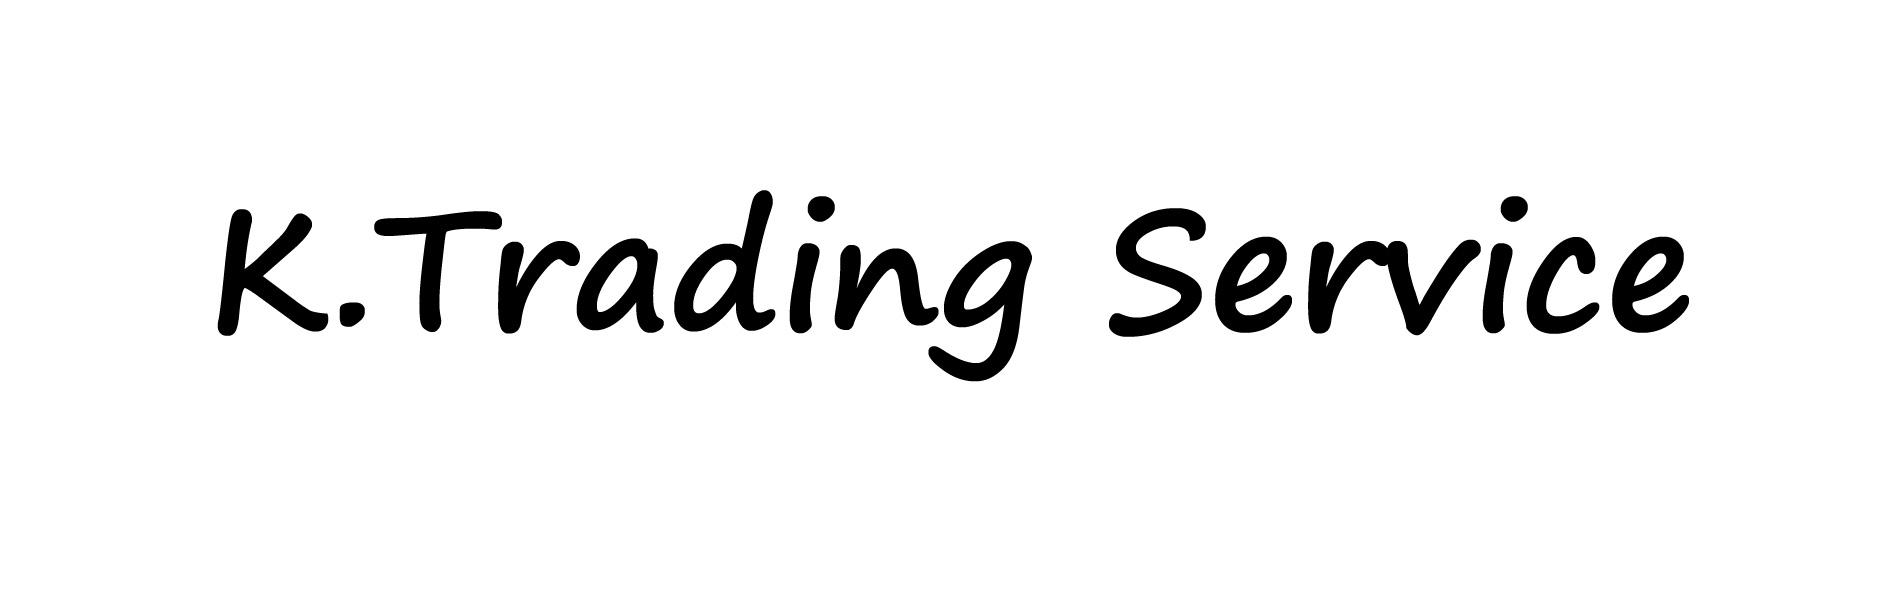 K.Trading Service